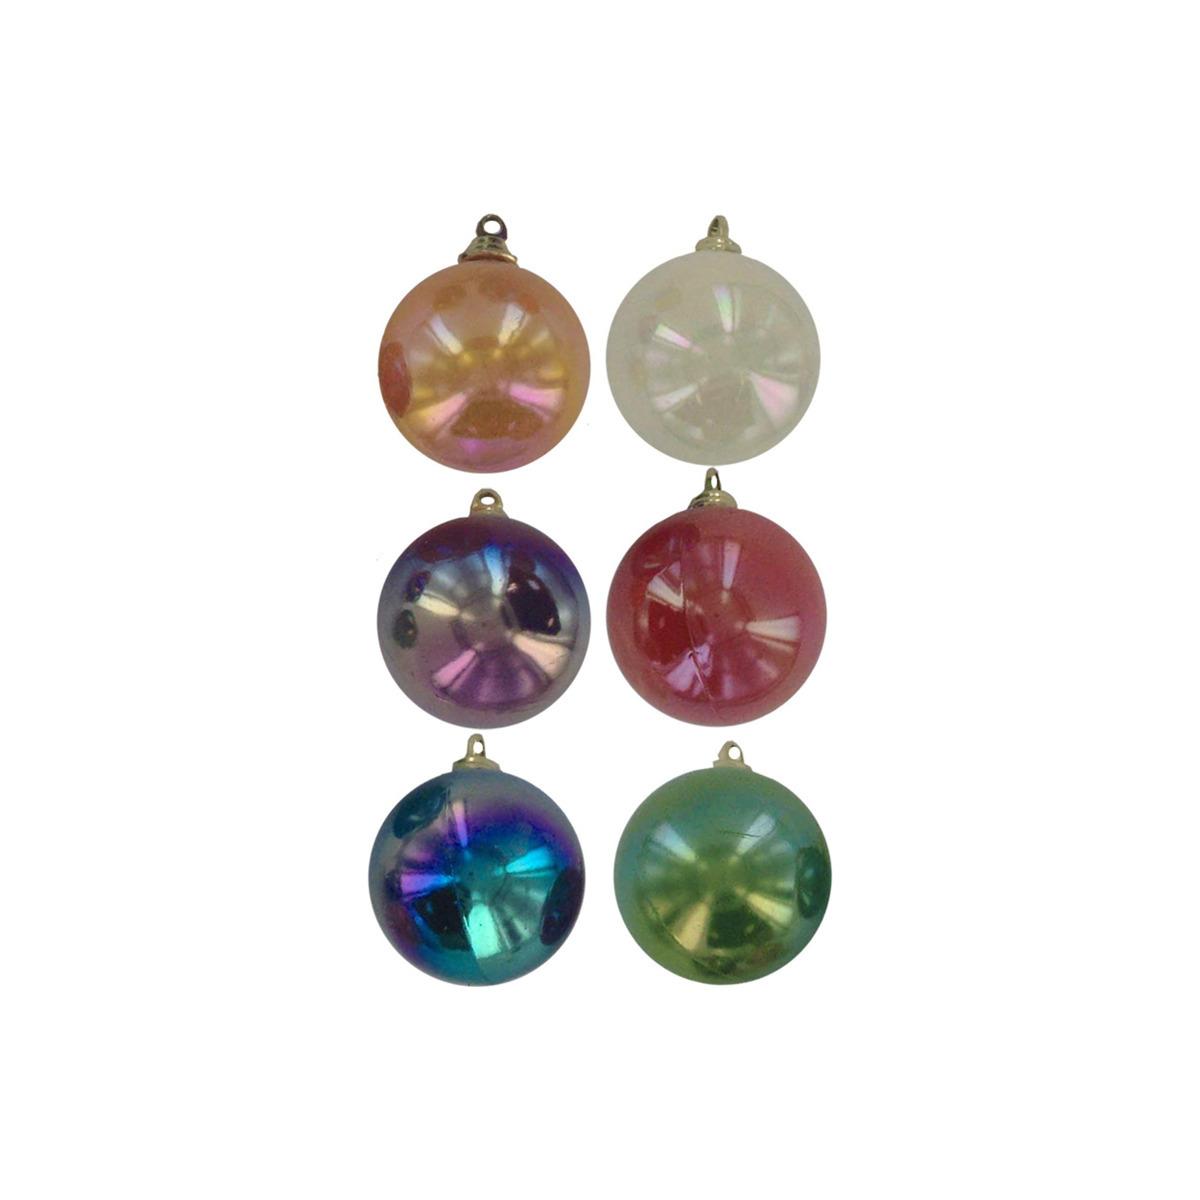 Bulk Christmas Ornaments Balls: Wholesale Christmas Ball Ornaments, Pack Of 6 (SKU 426157